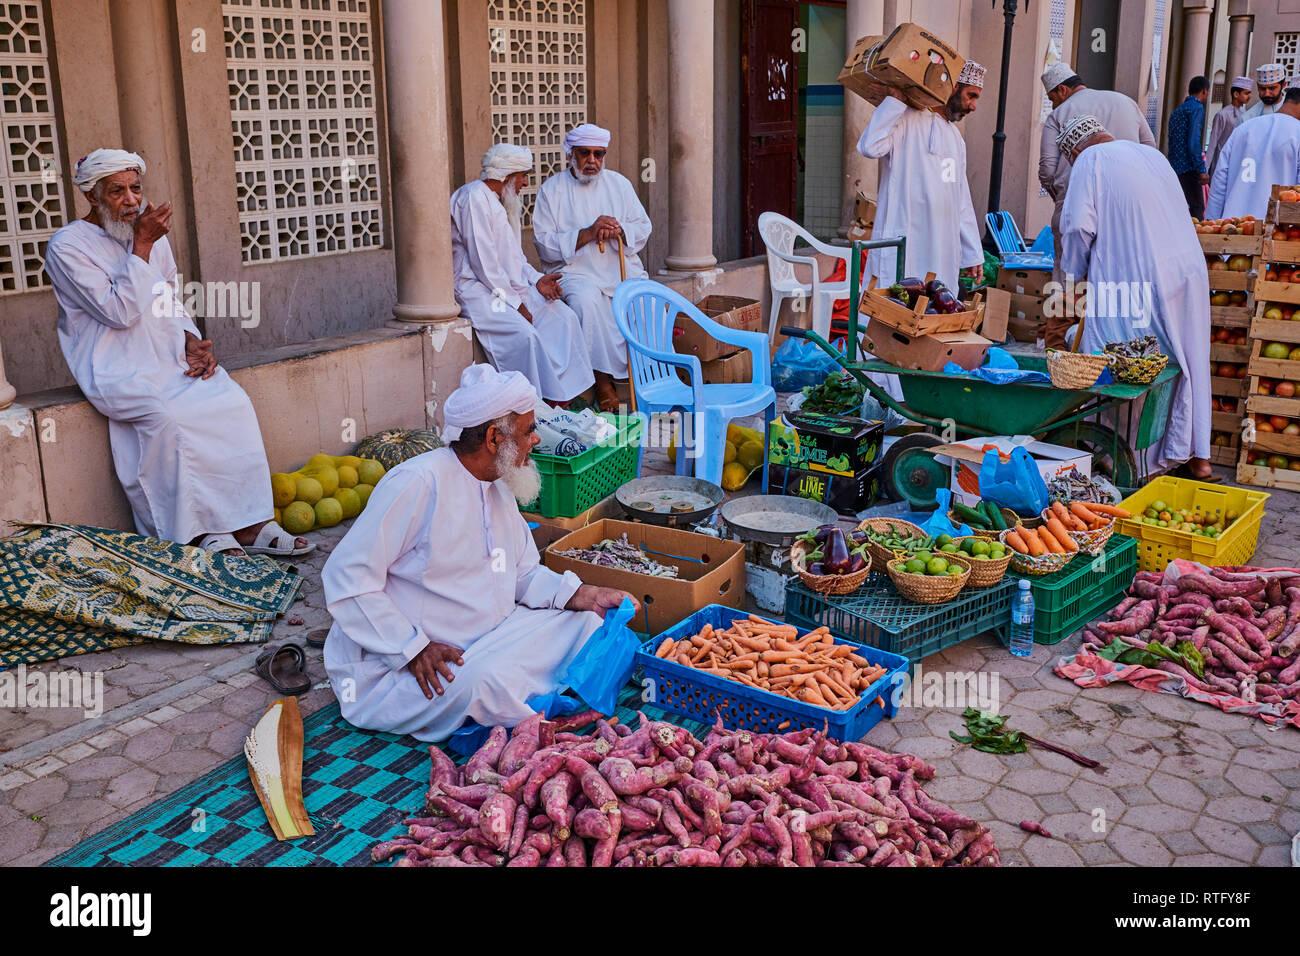 Sultanate of Oman, Ad-Dakhiliyah Region, Nizwa, friday vegetable market Stock Photo